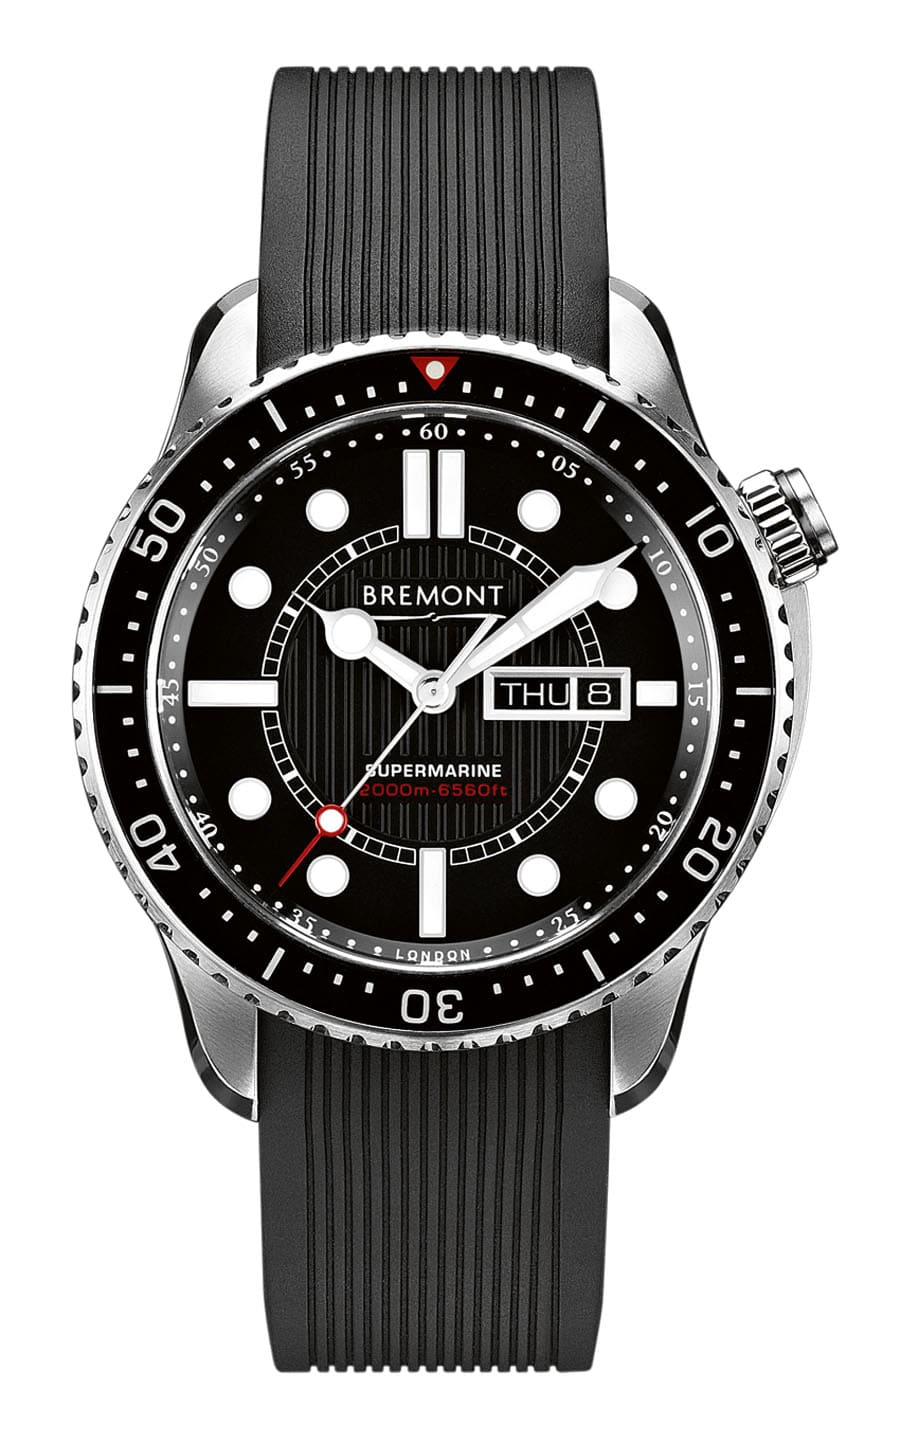 Bremont: Supermarine S2000